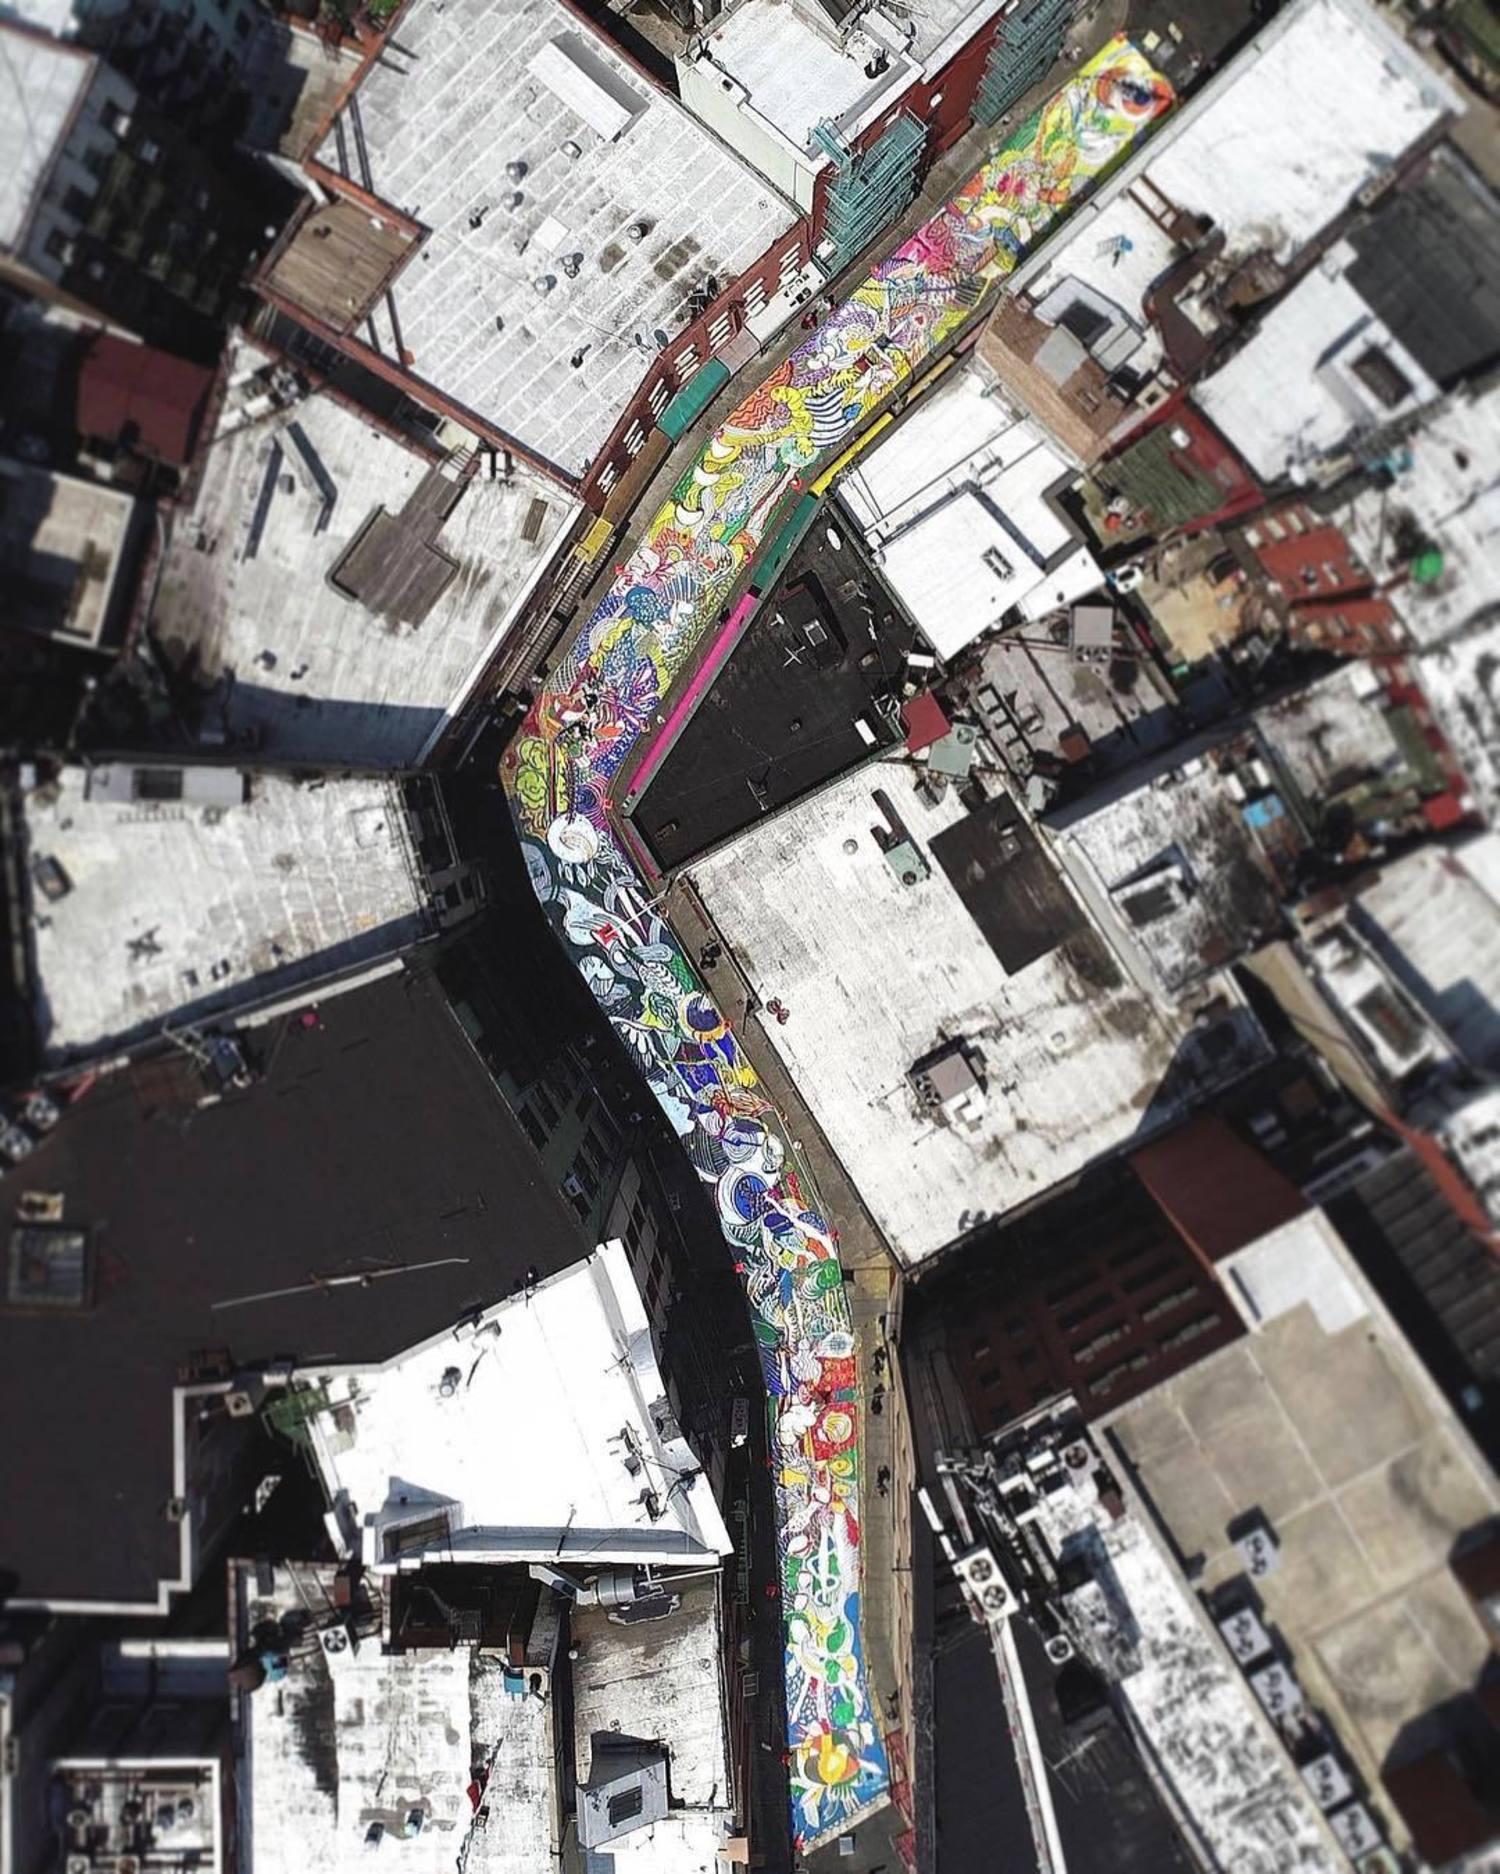 The fourth day!  一条彩色流动的河, 一条蜿蜒盘踞的龙, 一片流光溢彩的花海, 一曲跳跃音符的乐章!